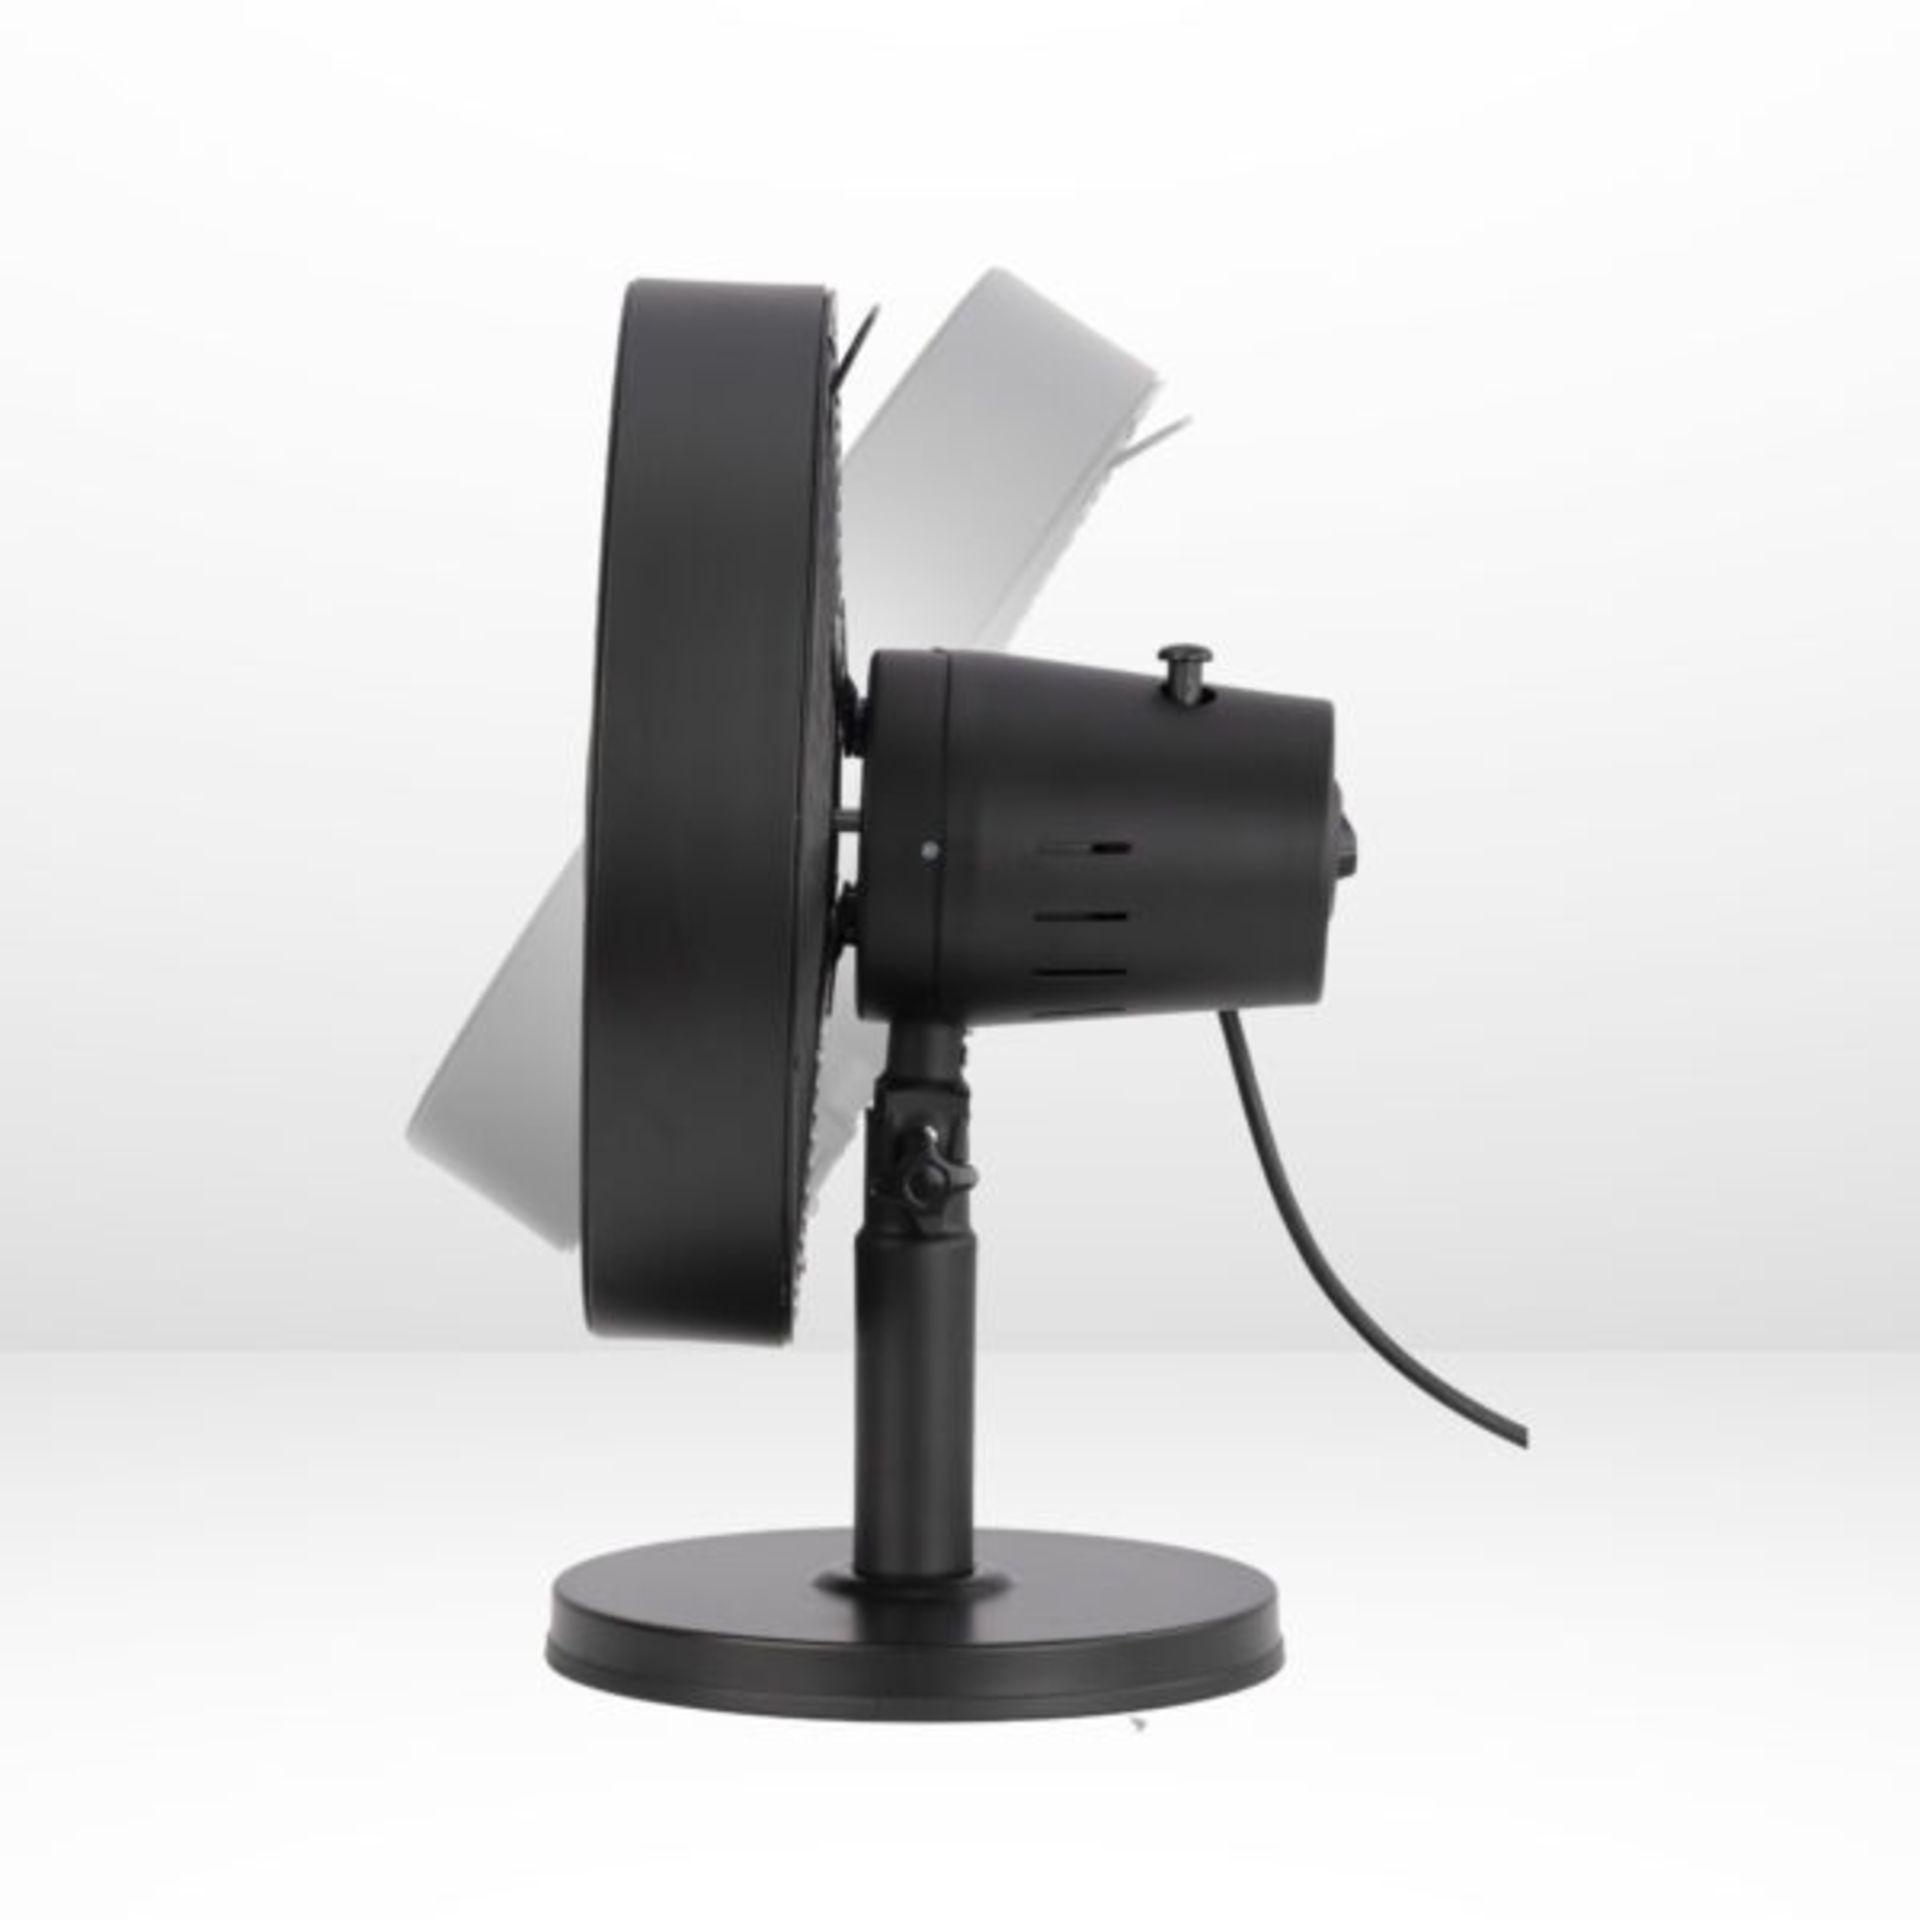 "(P9) 2x Arlec 12"" Matt Black 5 Blade Metal Desk Fan RRP £39 Each. Both Units Appear As New, But Da - Image 2 of 6"